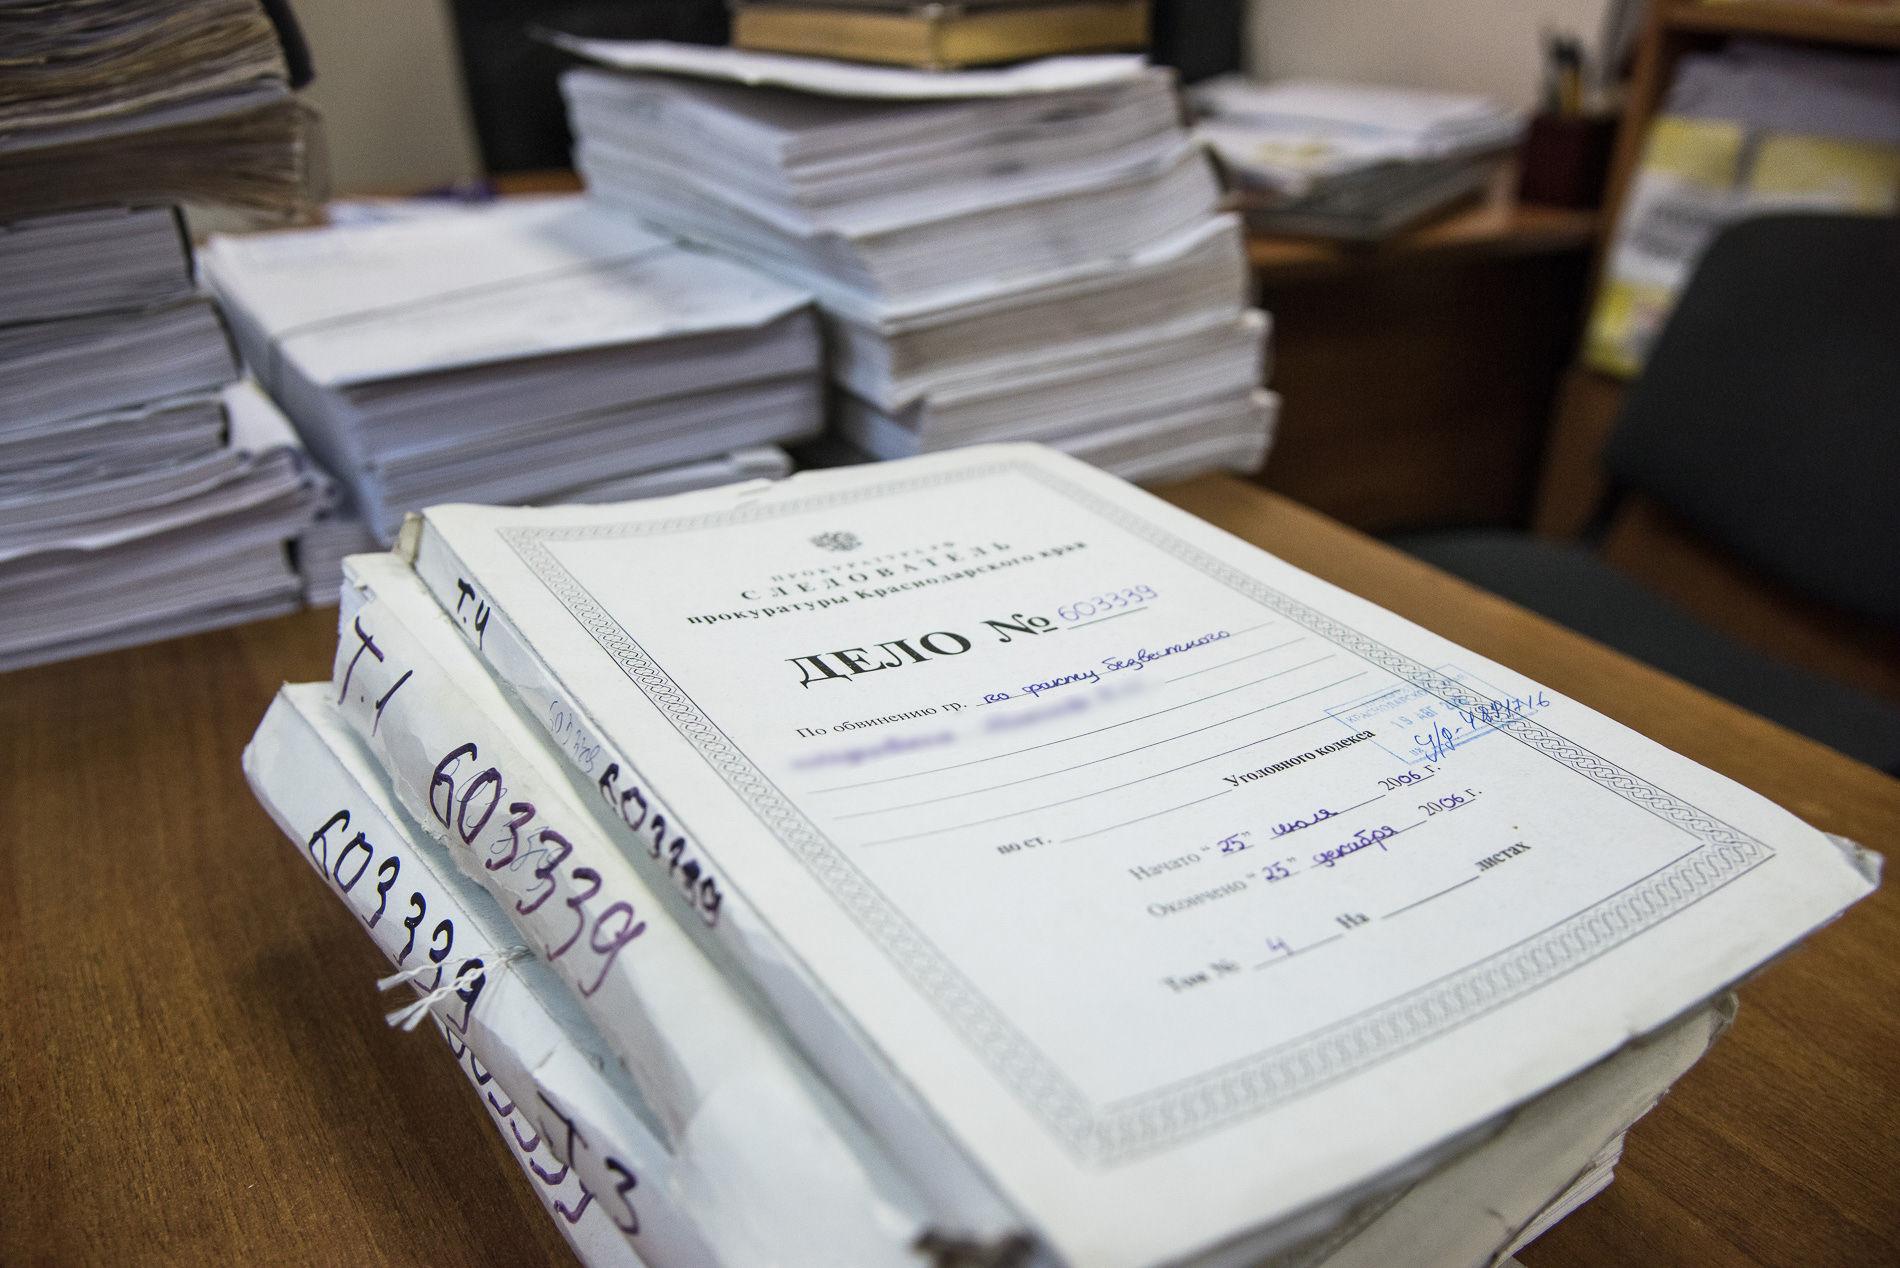 Гражданин Владикавказа скончался впроцессе операции из-за ошибки хирурга